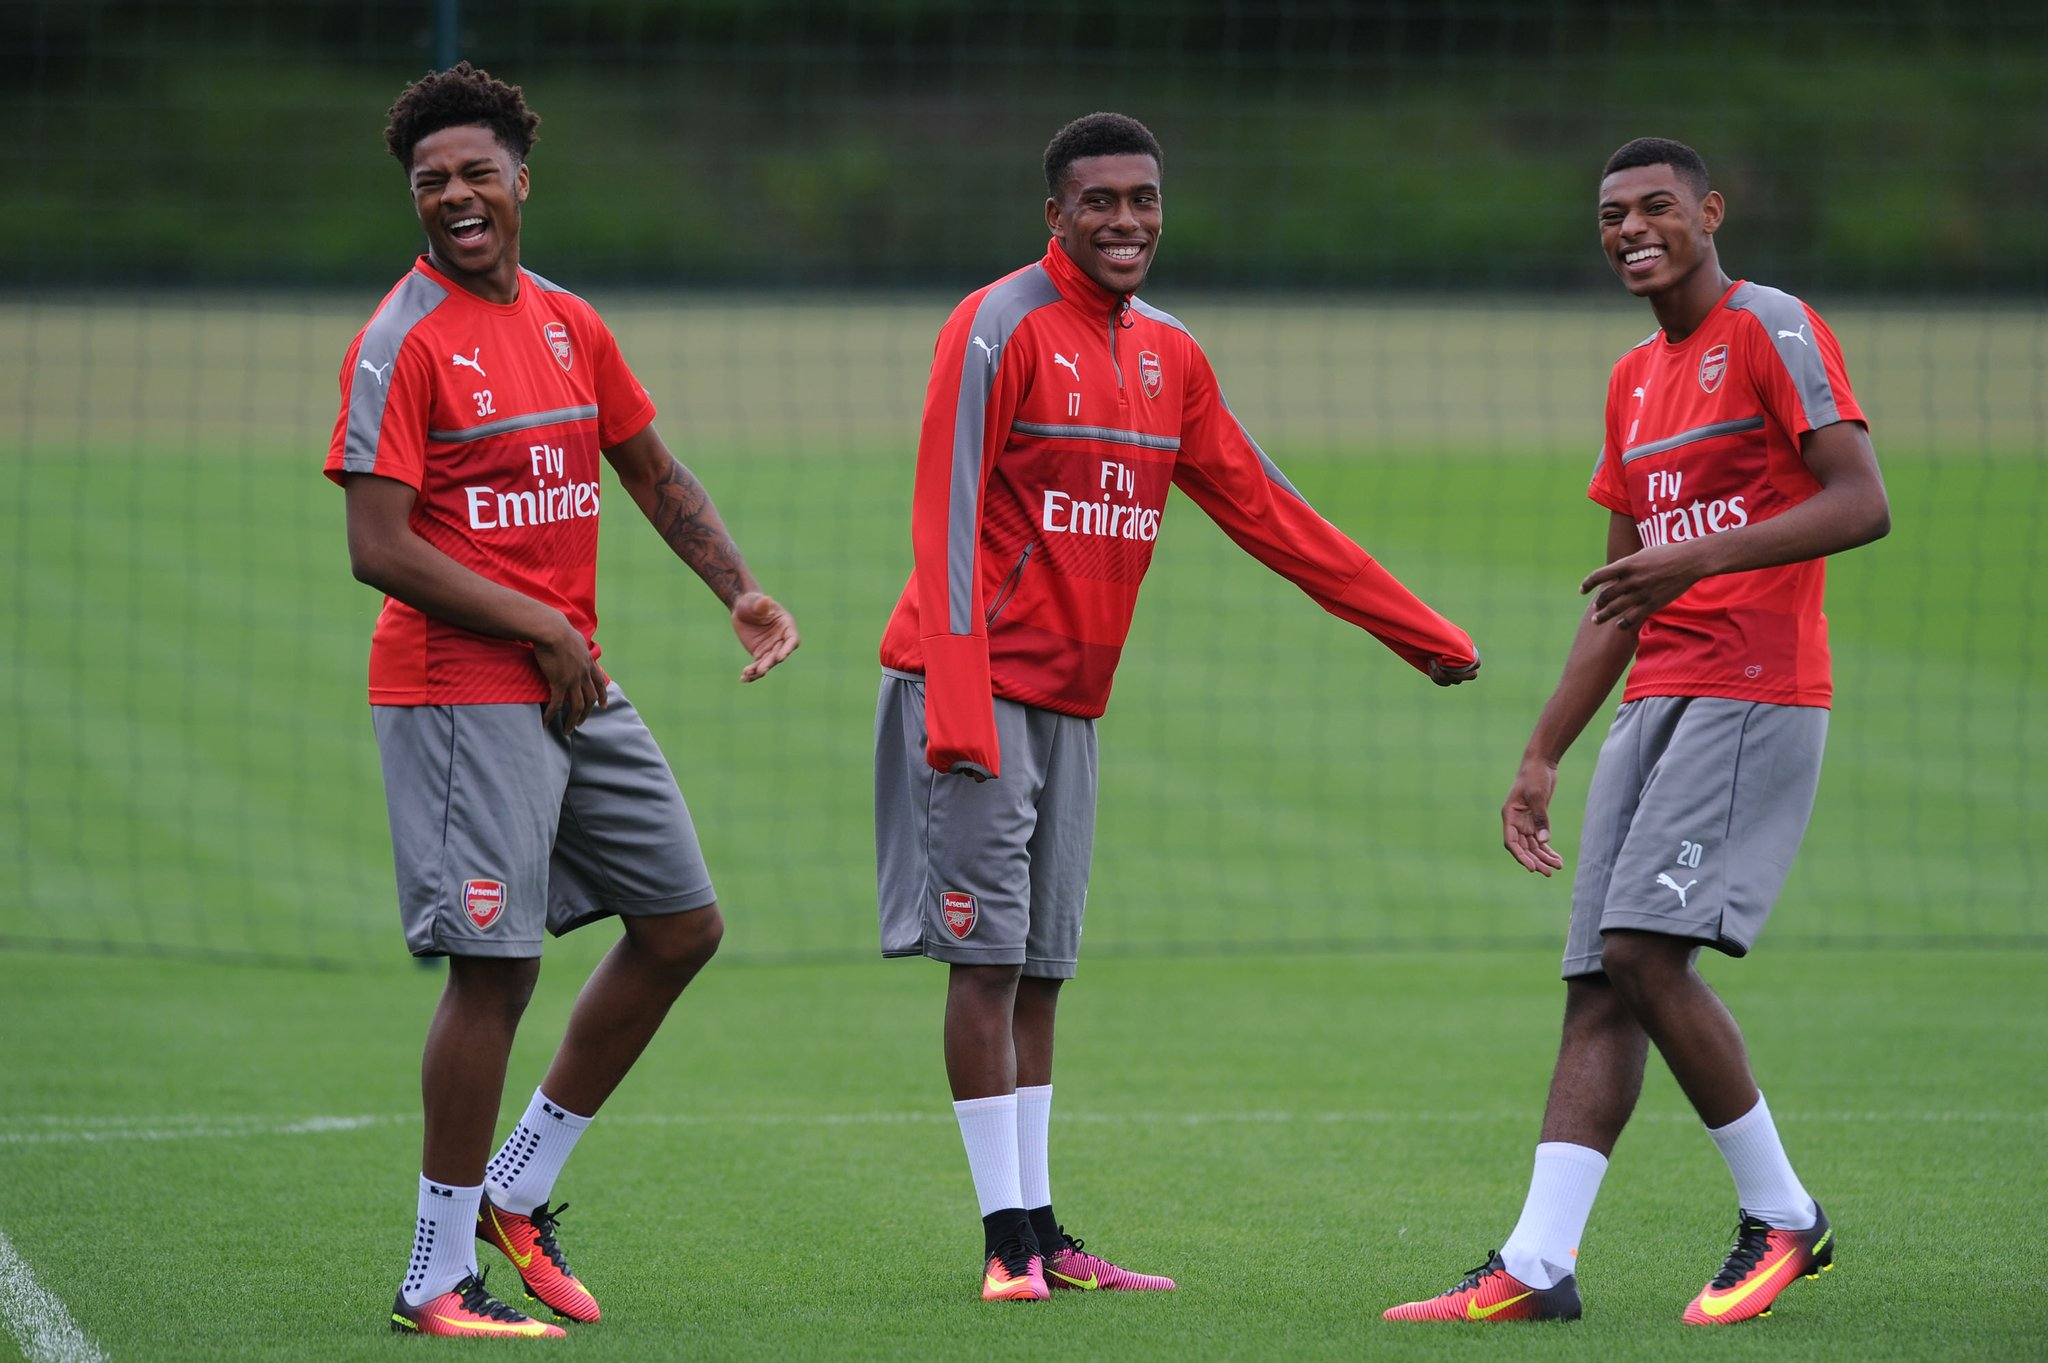 Iwobi, Akpom, Sanogo Rejoin Arsenal For Pre-Season